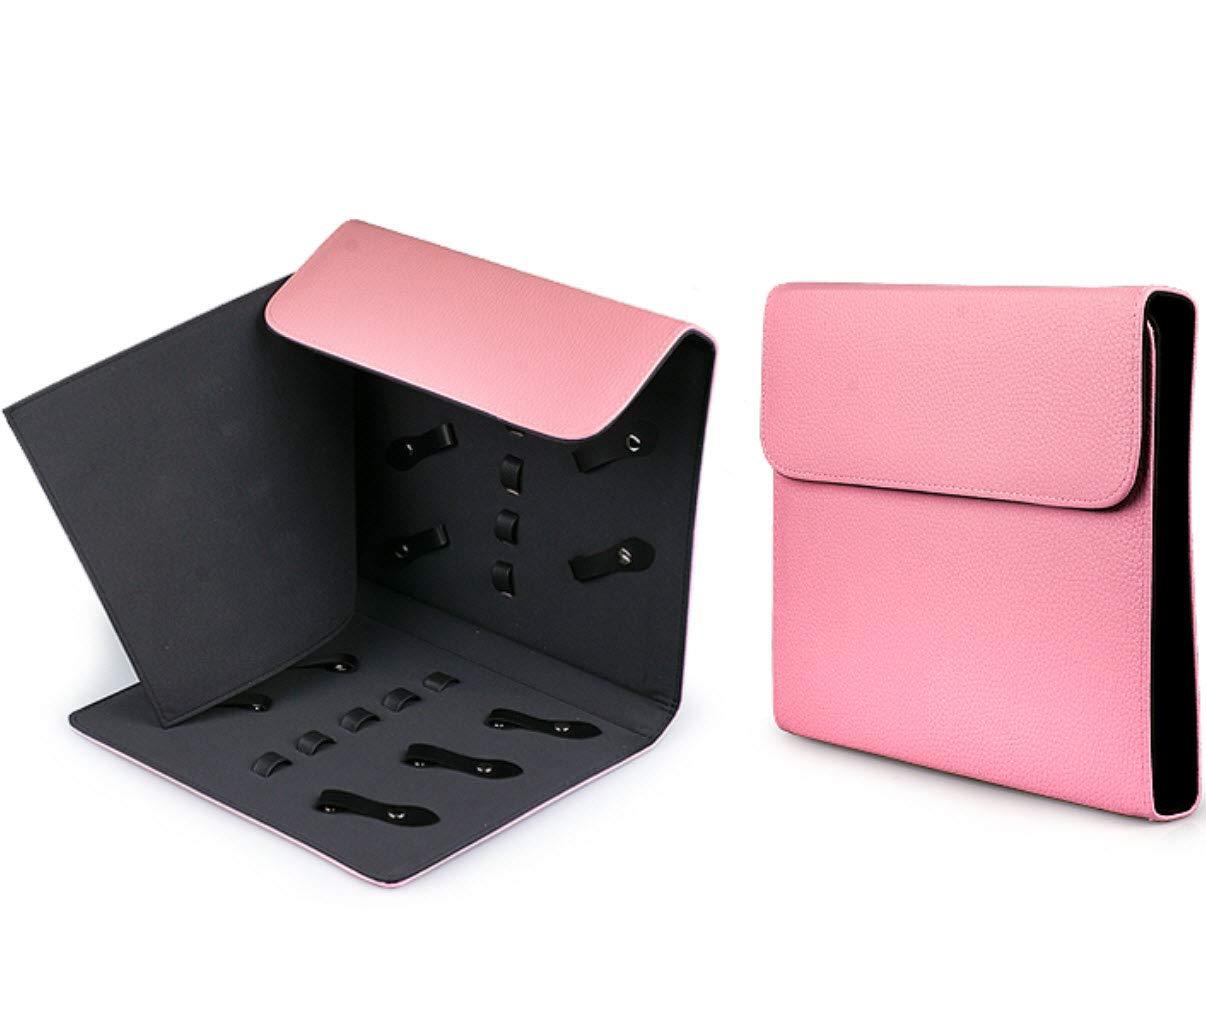 Truewin Hairdressing Scissors 10 Holders Display Case Bag Sample Board Shears (Pink) by Truewin